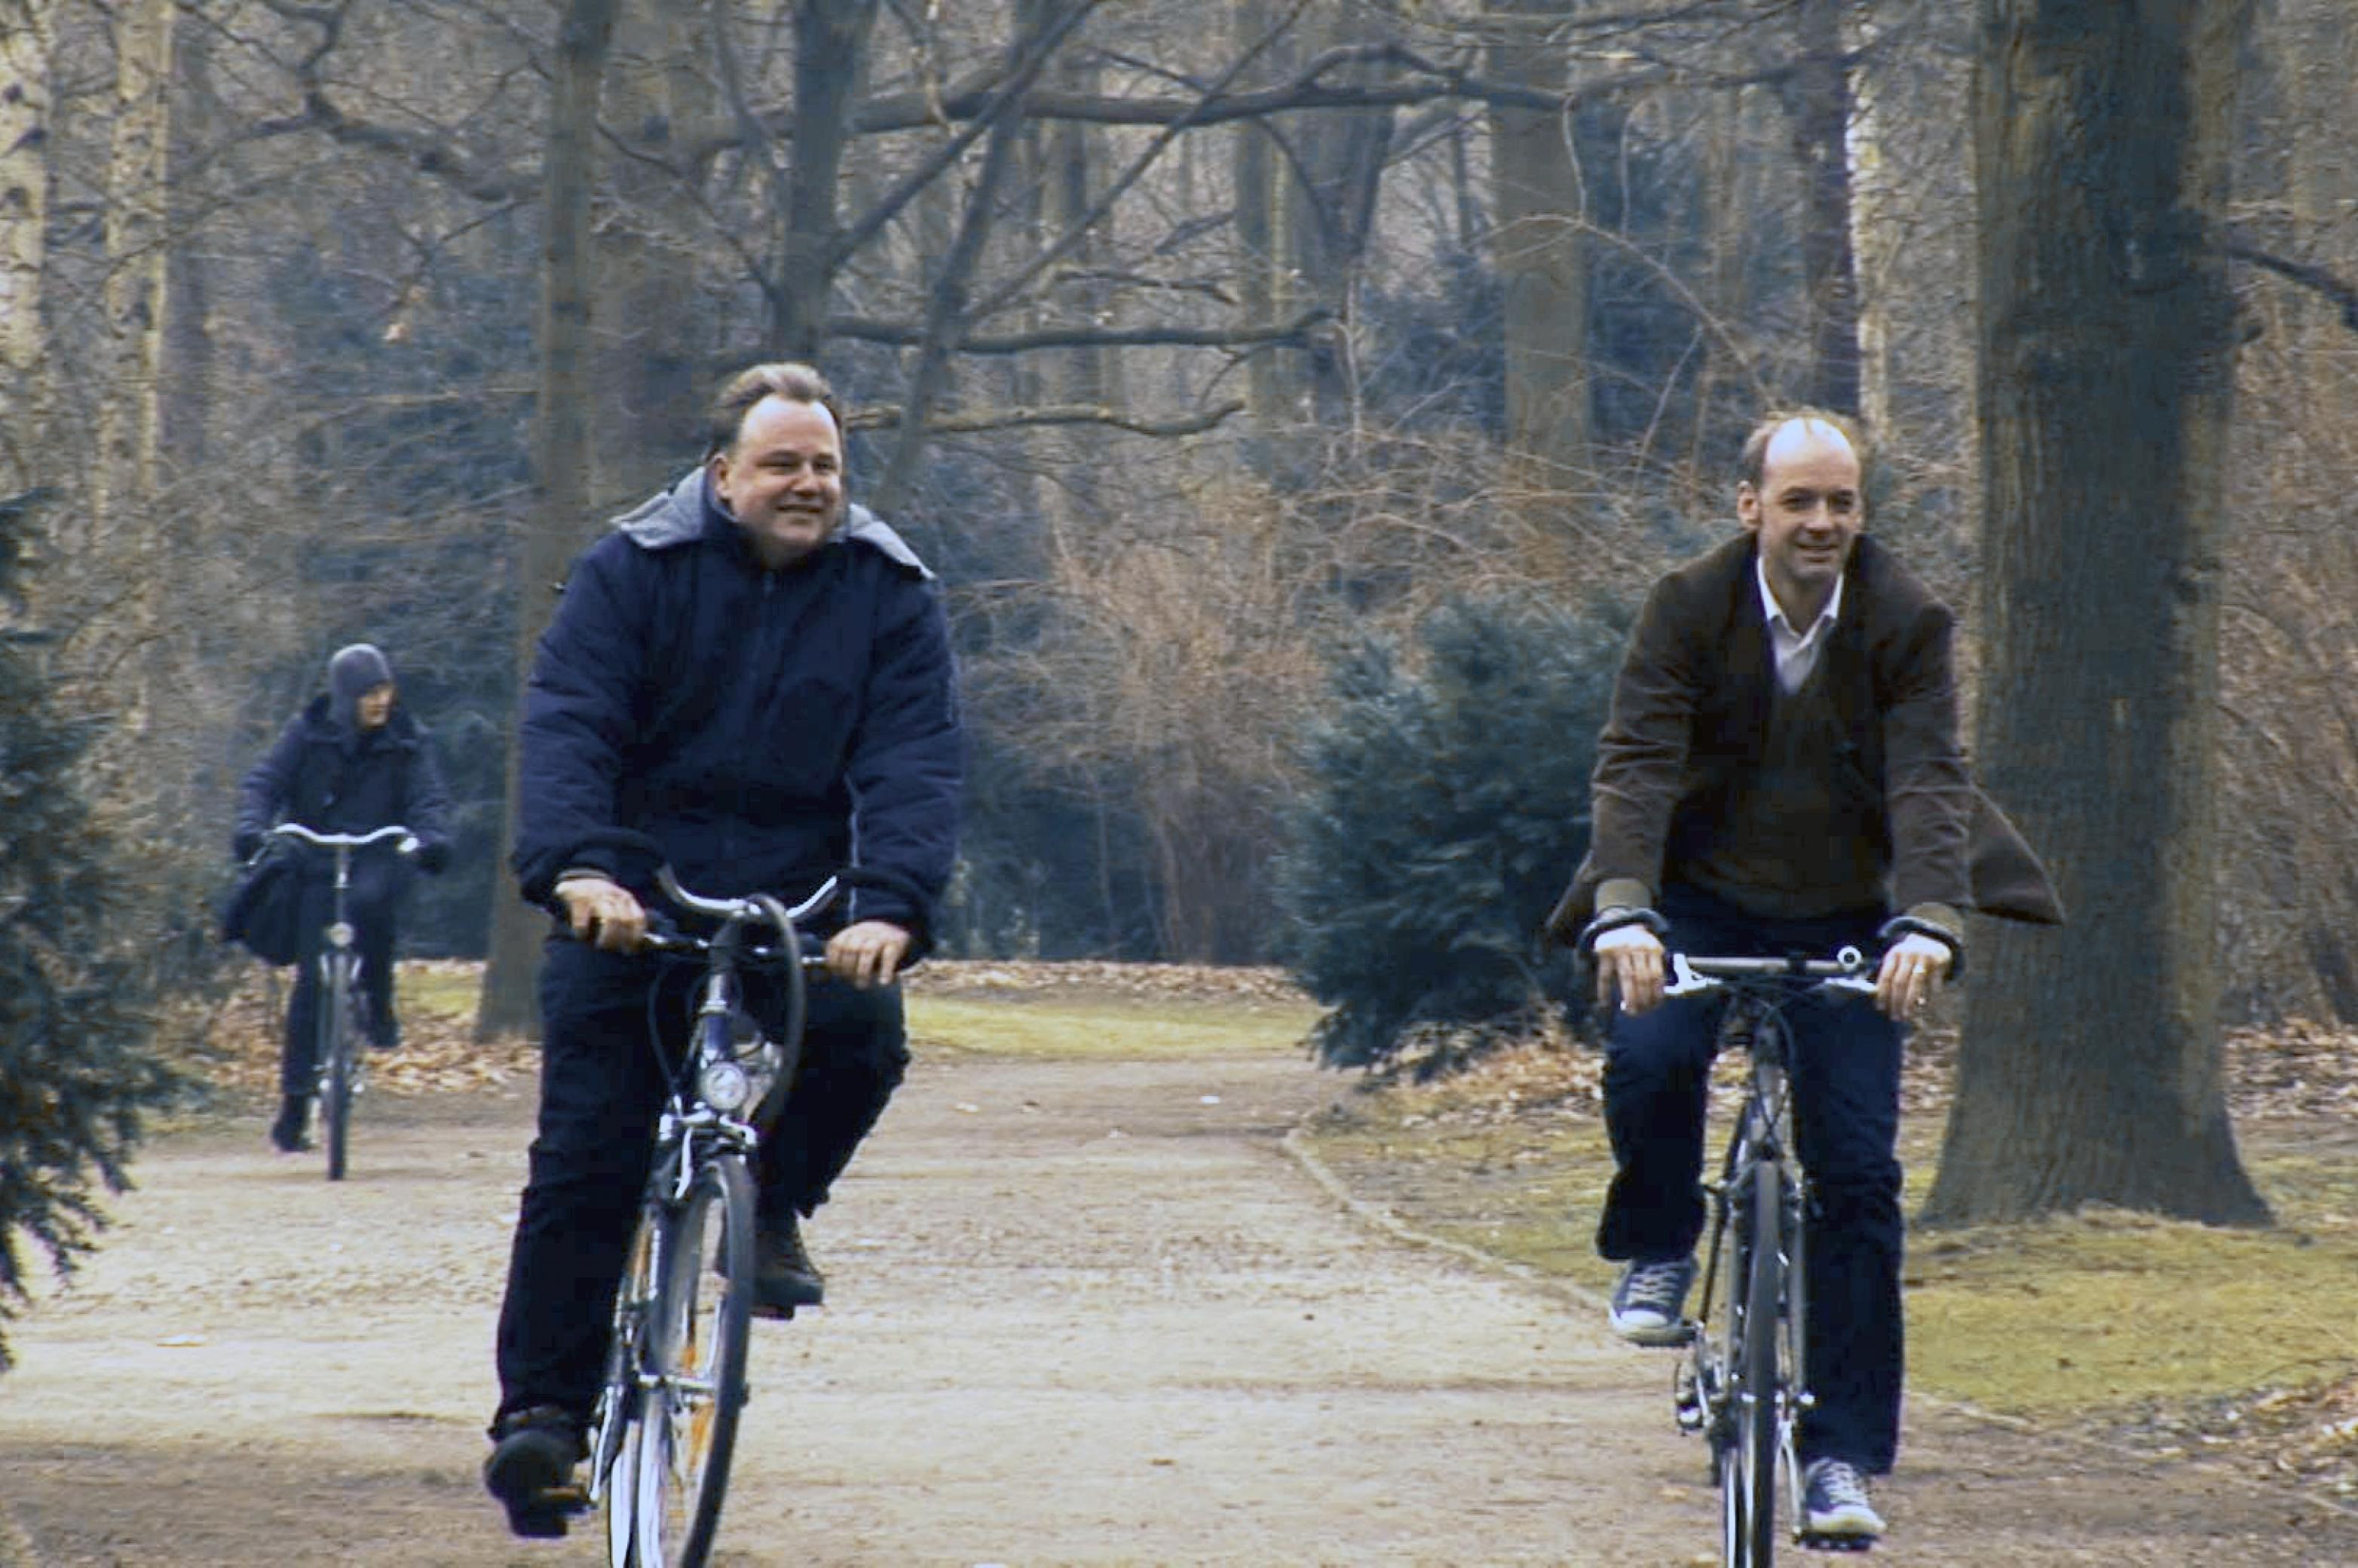 Fahrrad fahren im Park